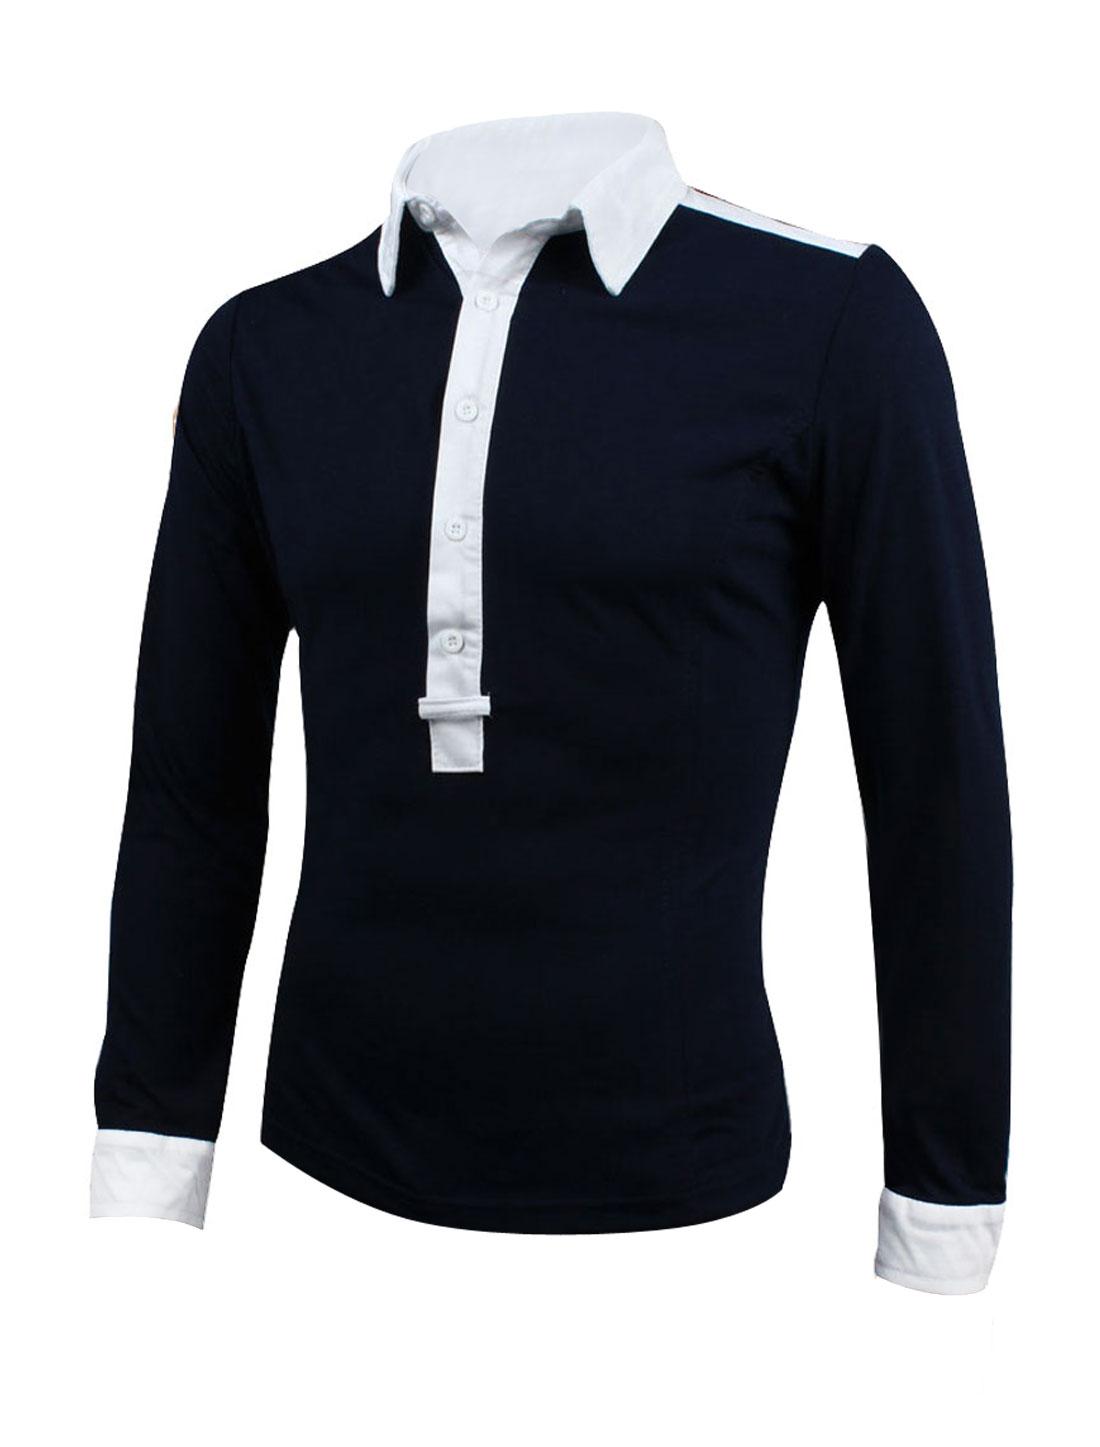 Man Slim Fit Slipover 1/2 Placket Navy Blue Casual Polo Shirt M